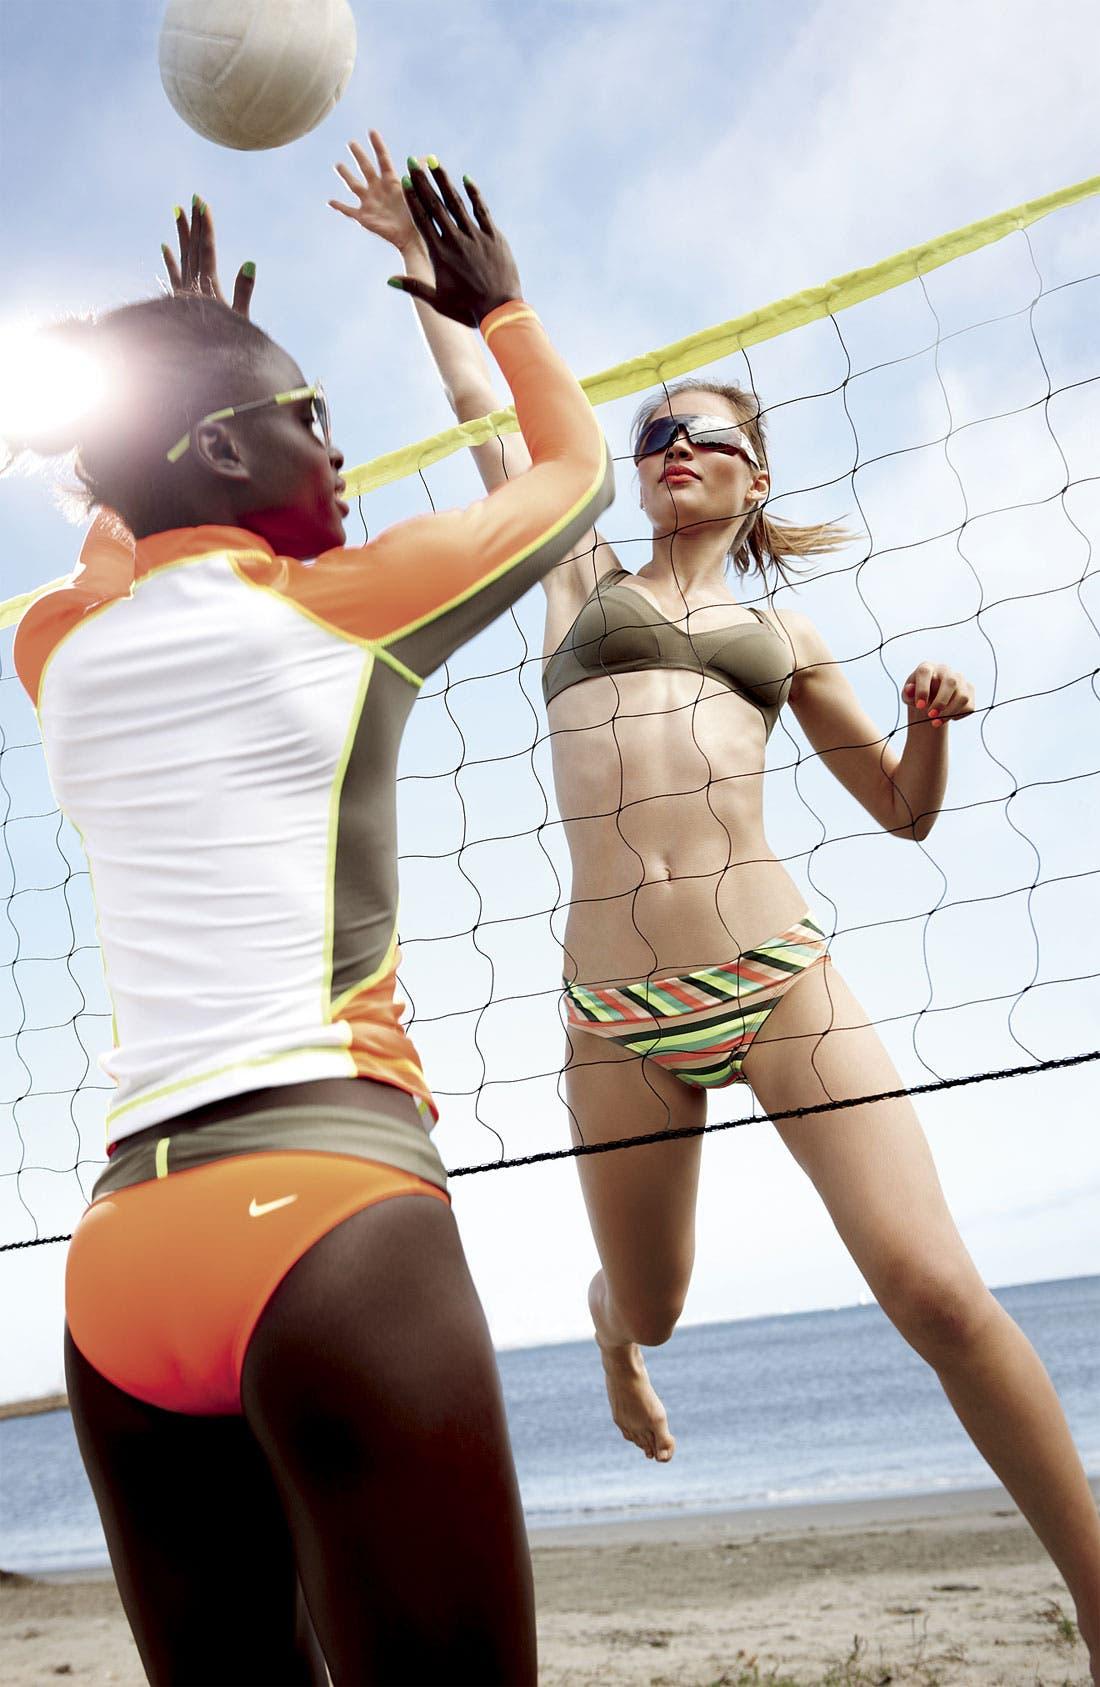 Alternate Image 1 Selected - Nike Rashguard & Bikini Bottoms